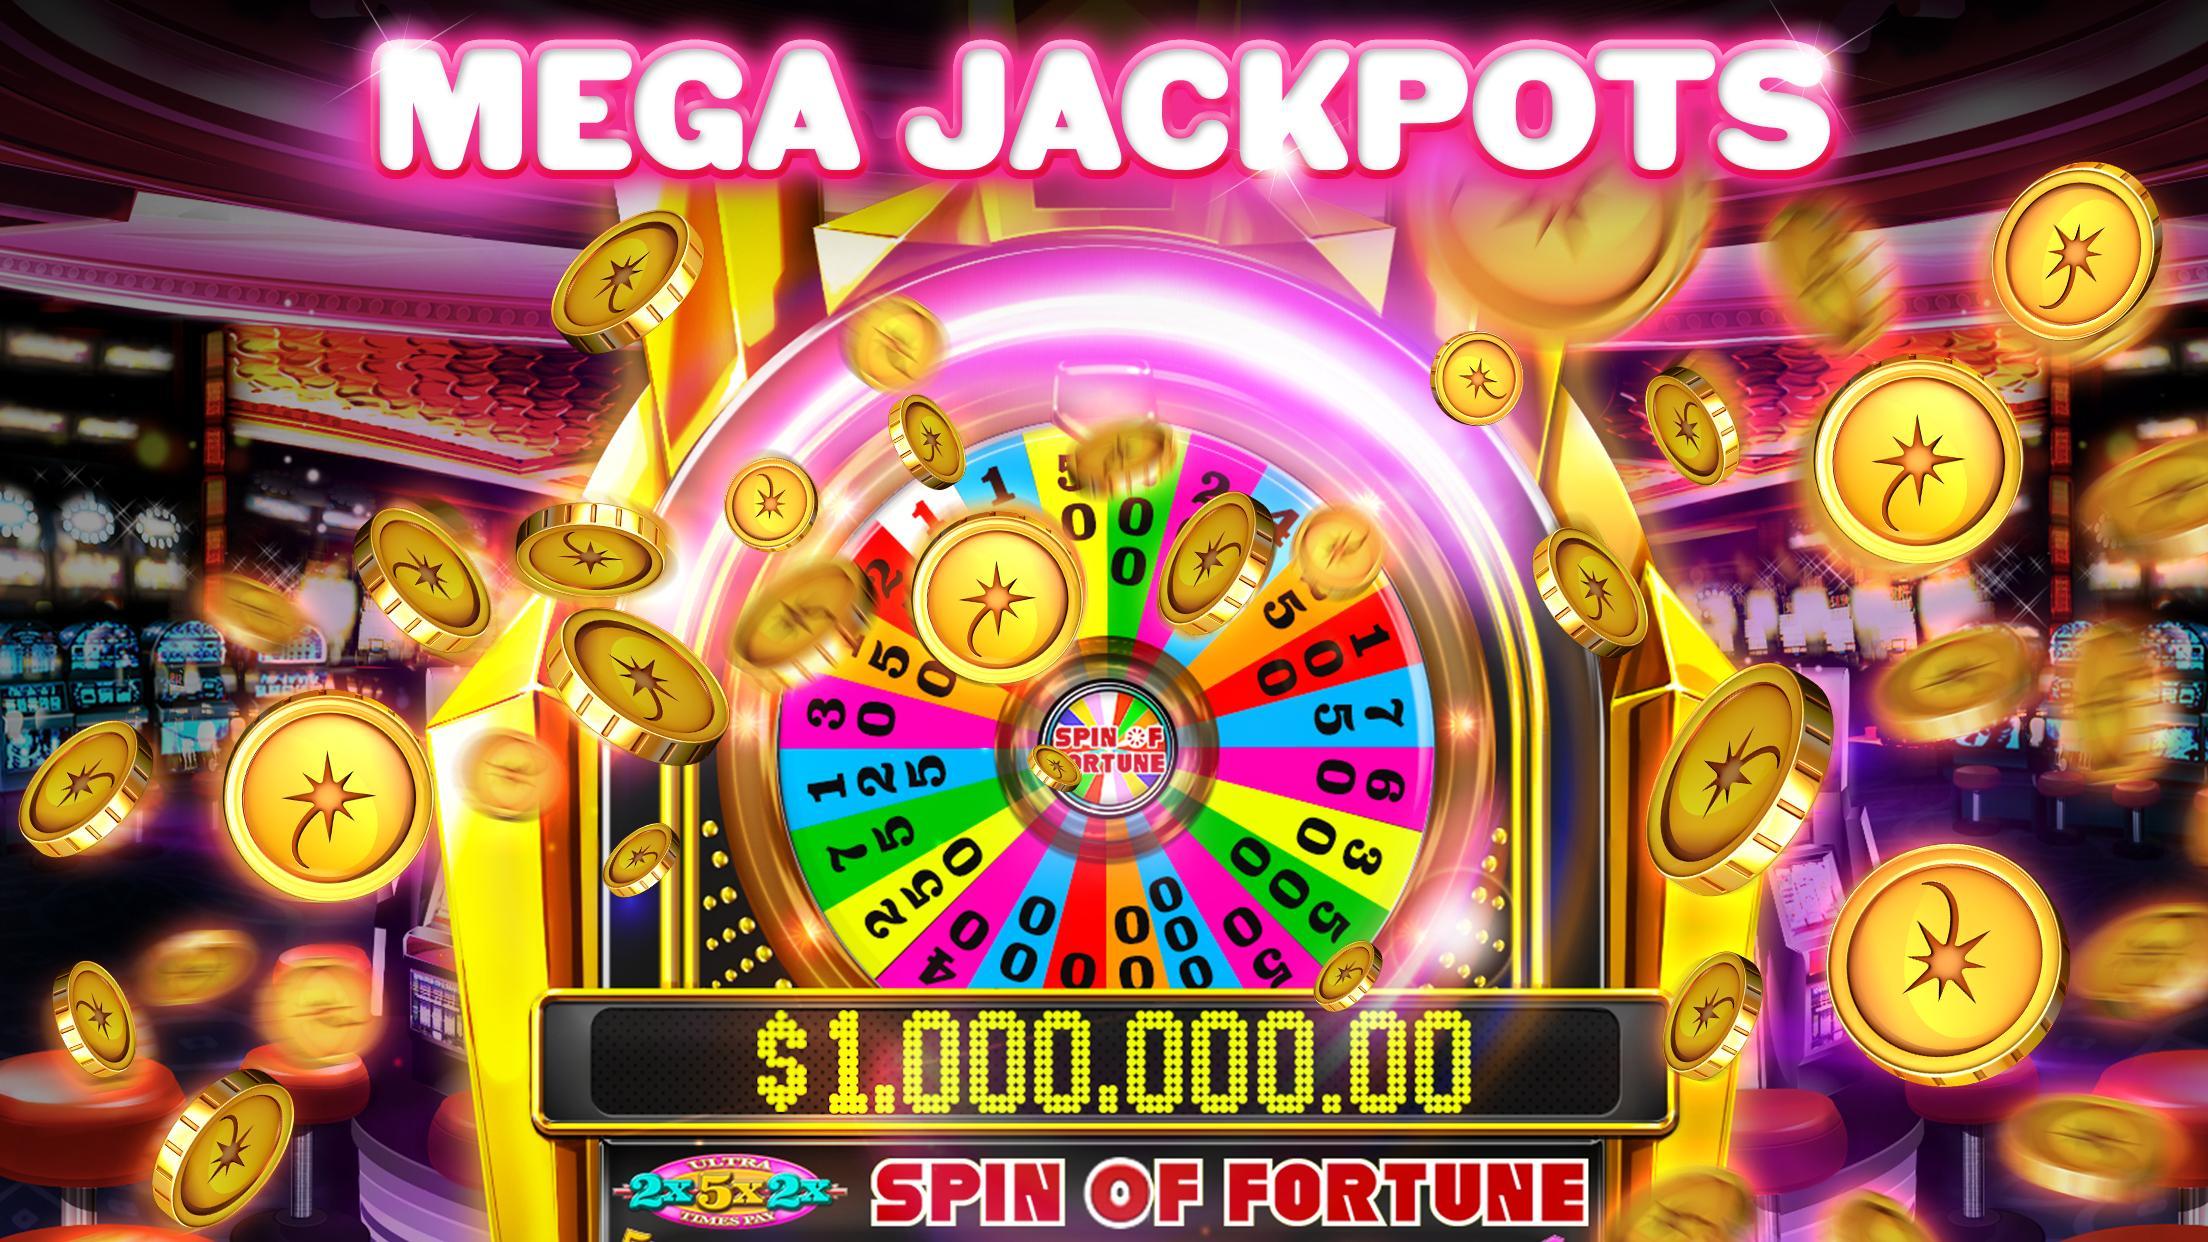 Jackpotjoy Slots Slot machines with Bonus Games 26.0.05 Screenshot 4